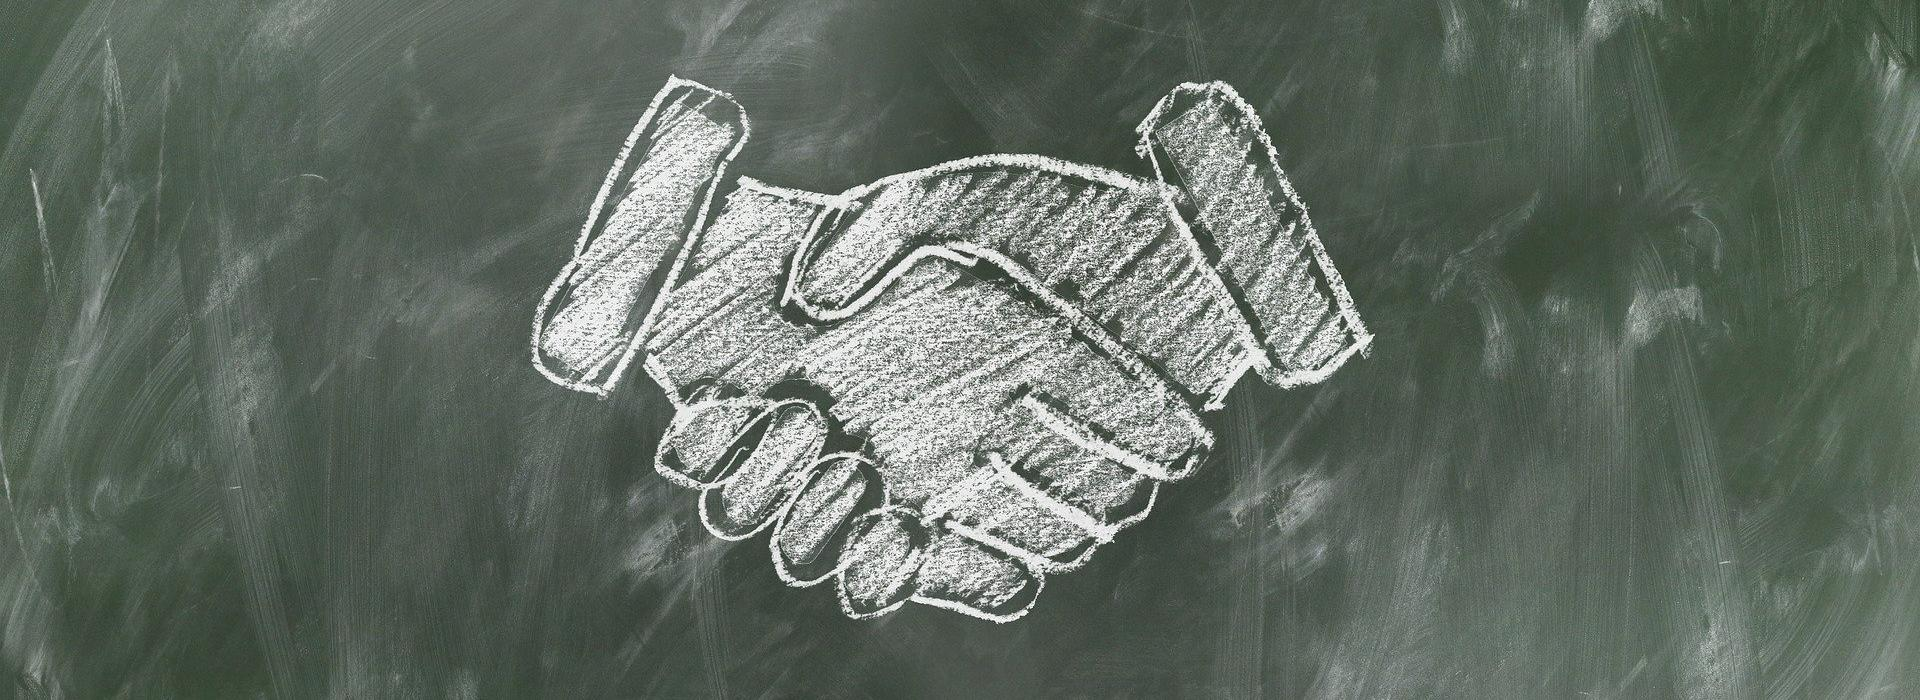 shaking-hands-2499612_1920.jpg